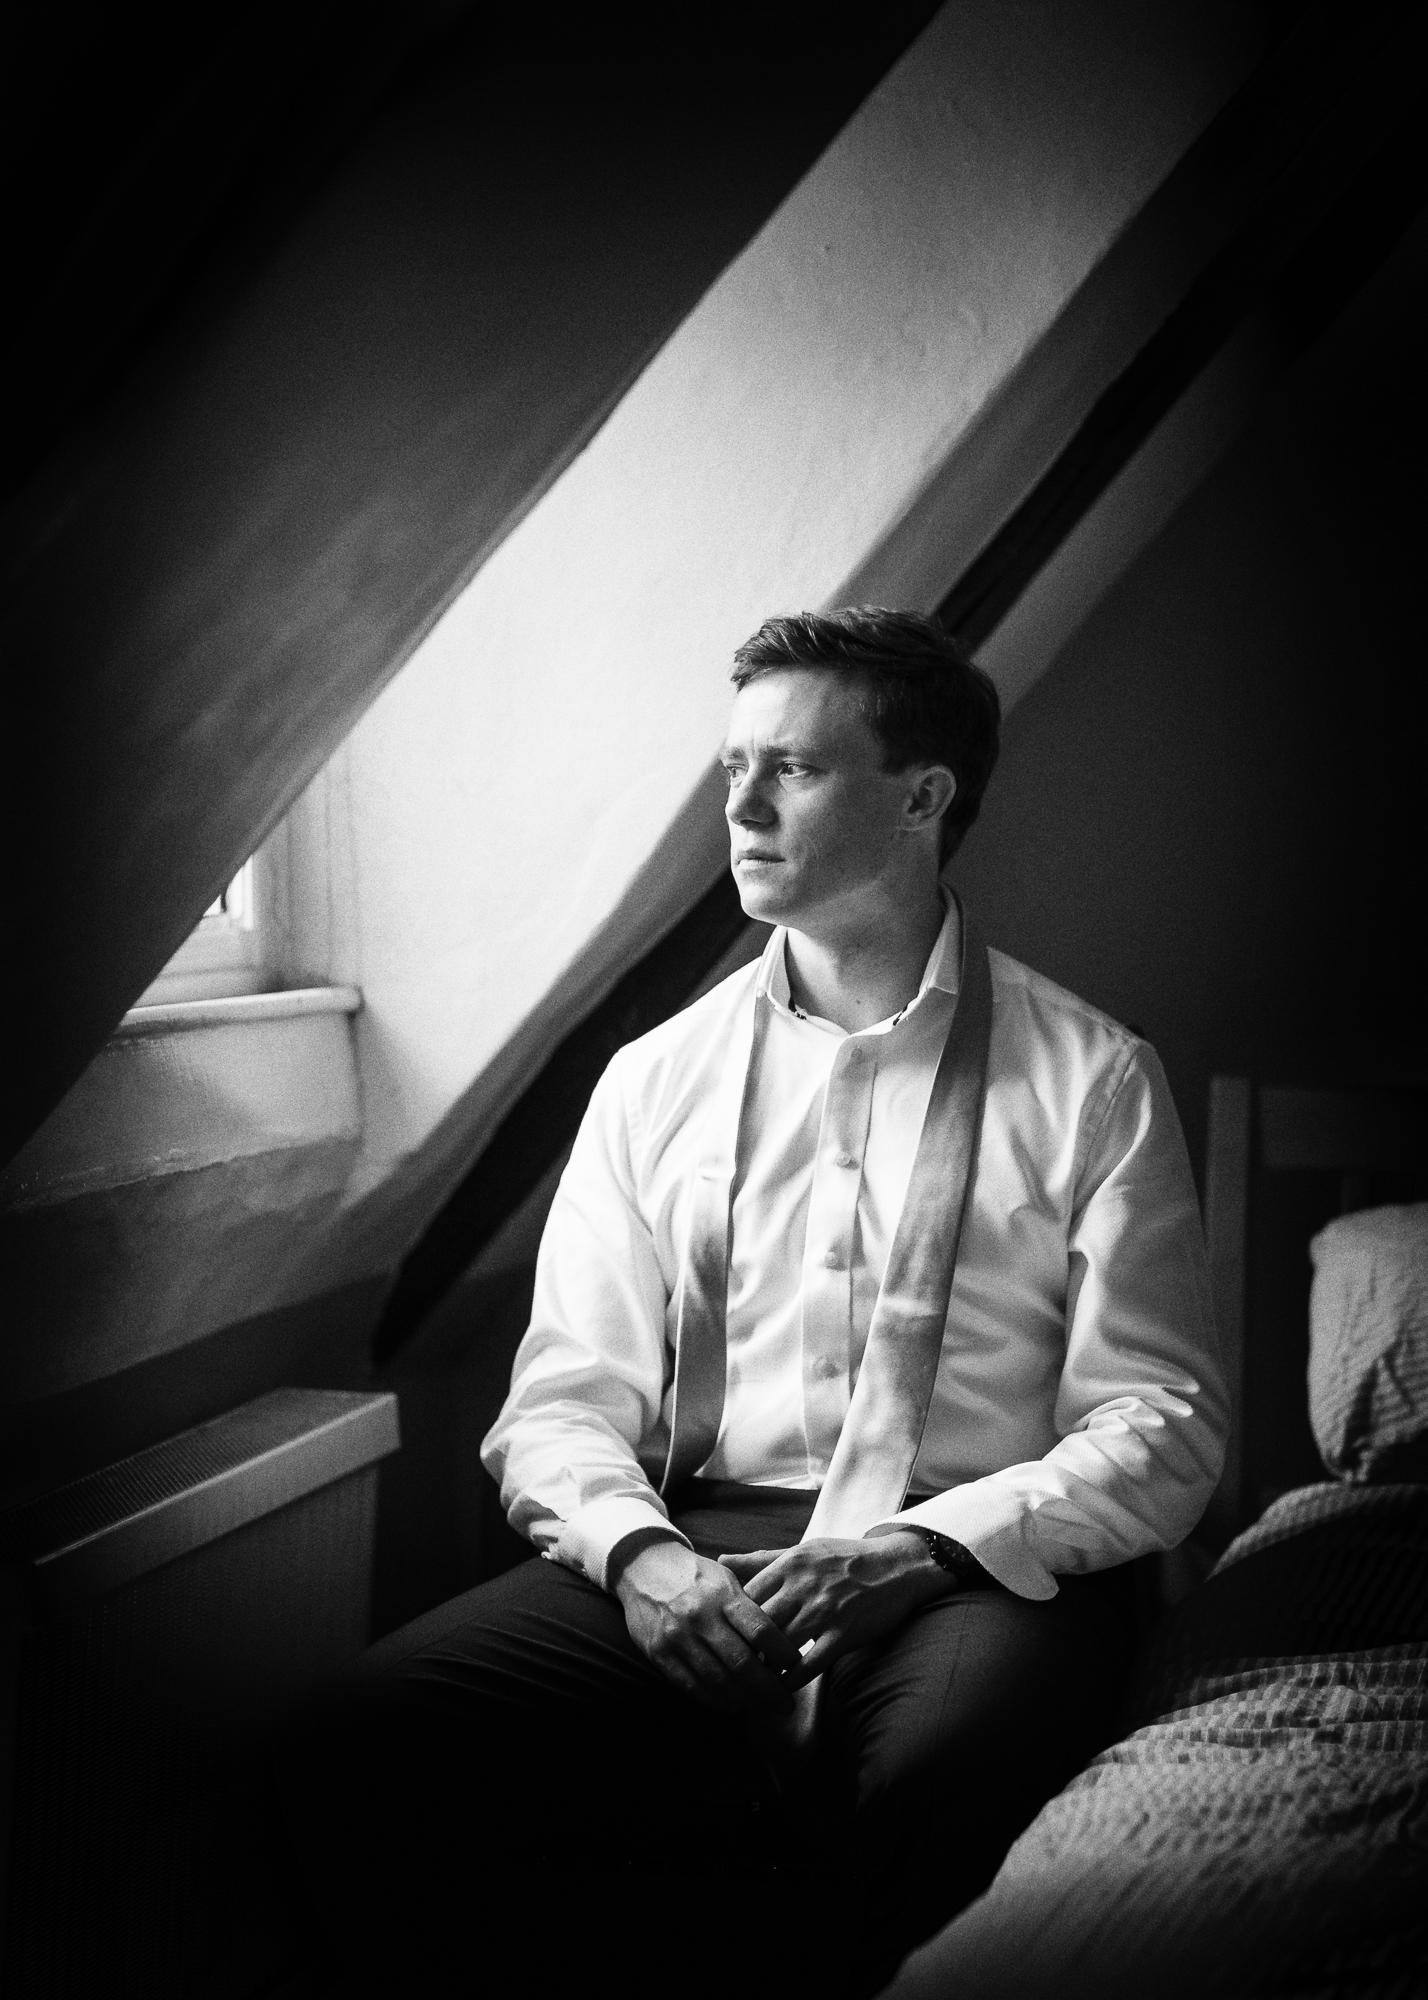 wedding photography portrait black white (1 of 2).jpg